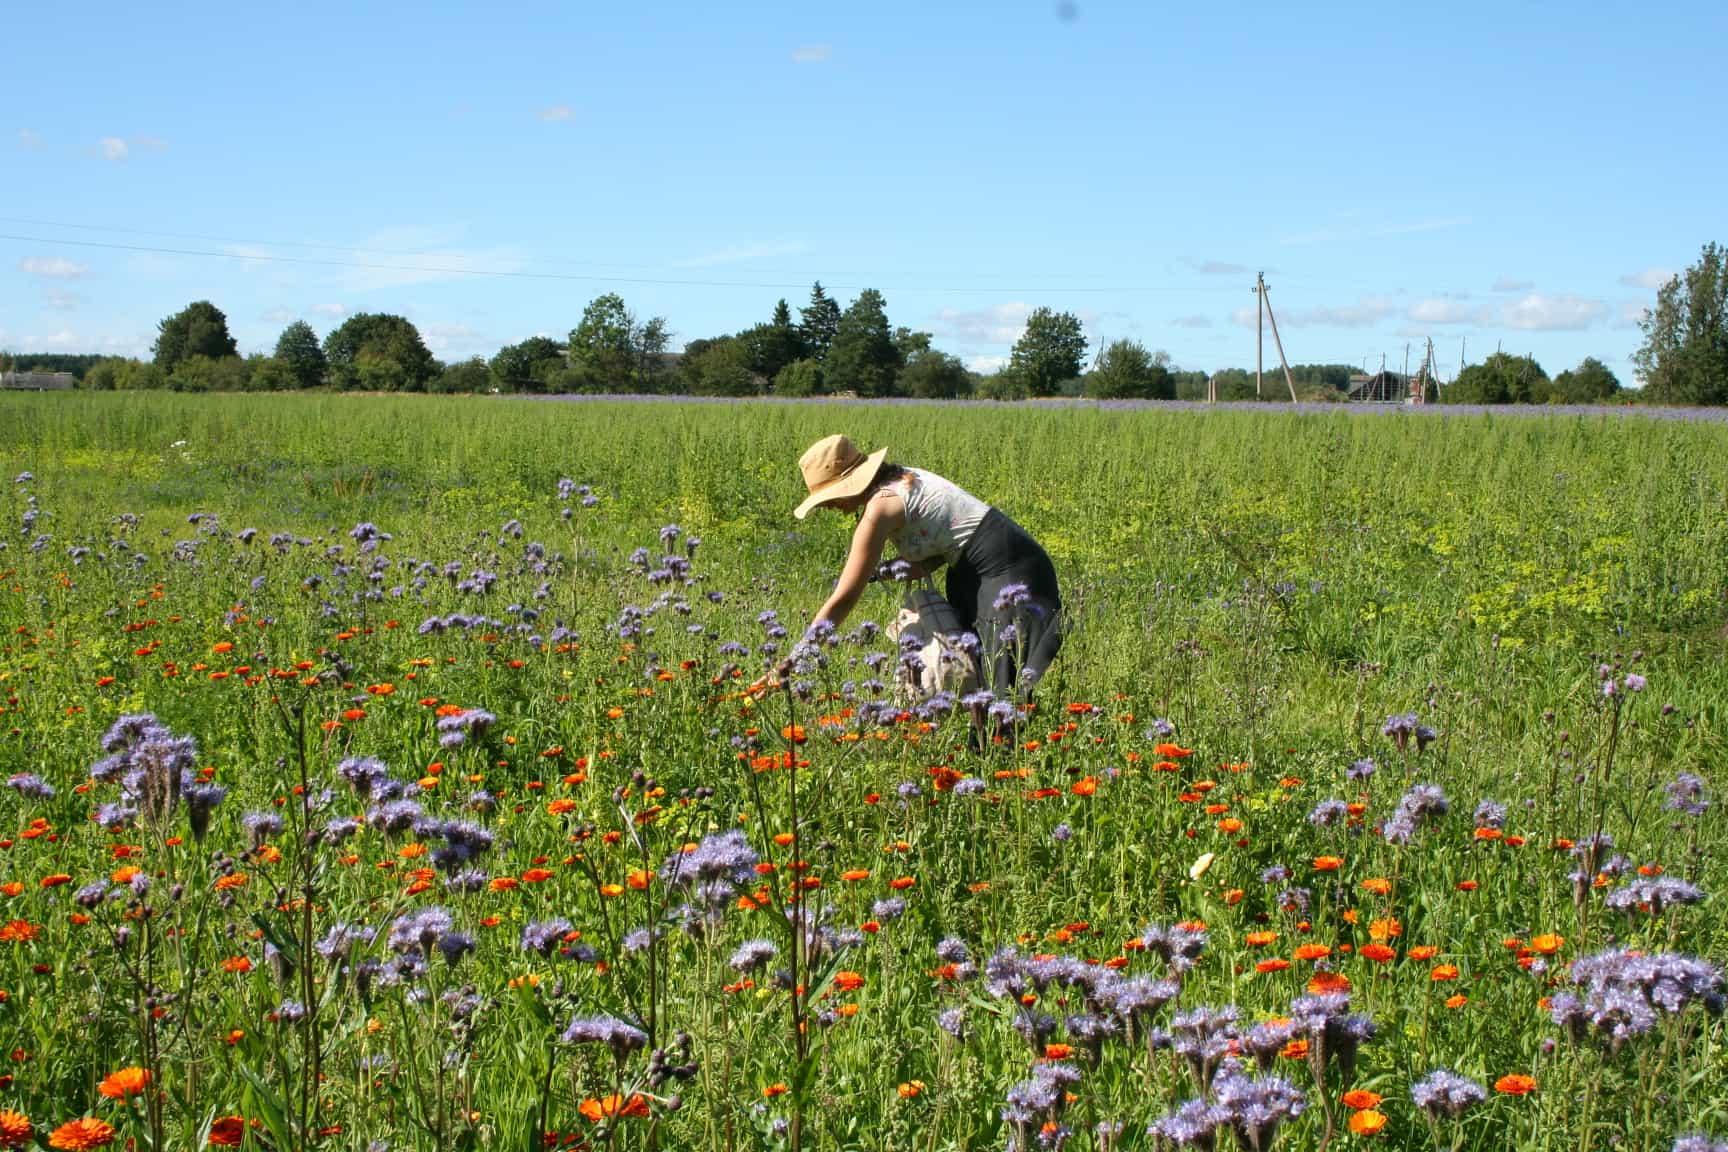 Naine korjamas taimi Natura Siberica Saaremaa farmi aladelt